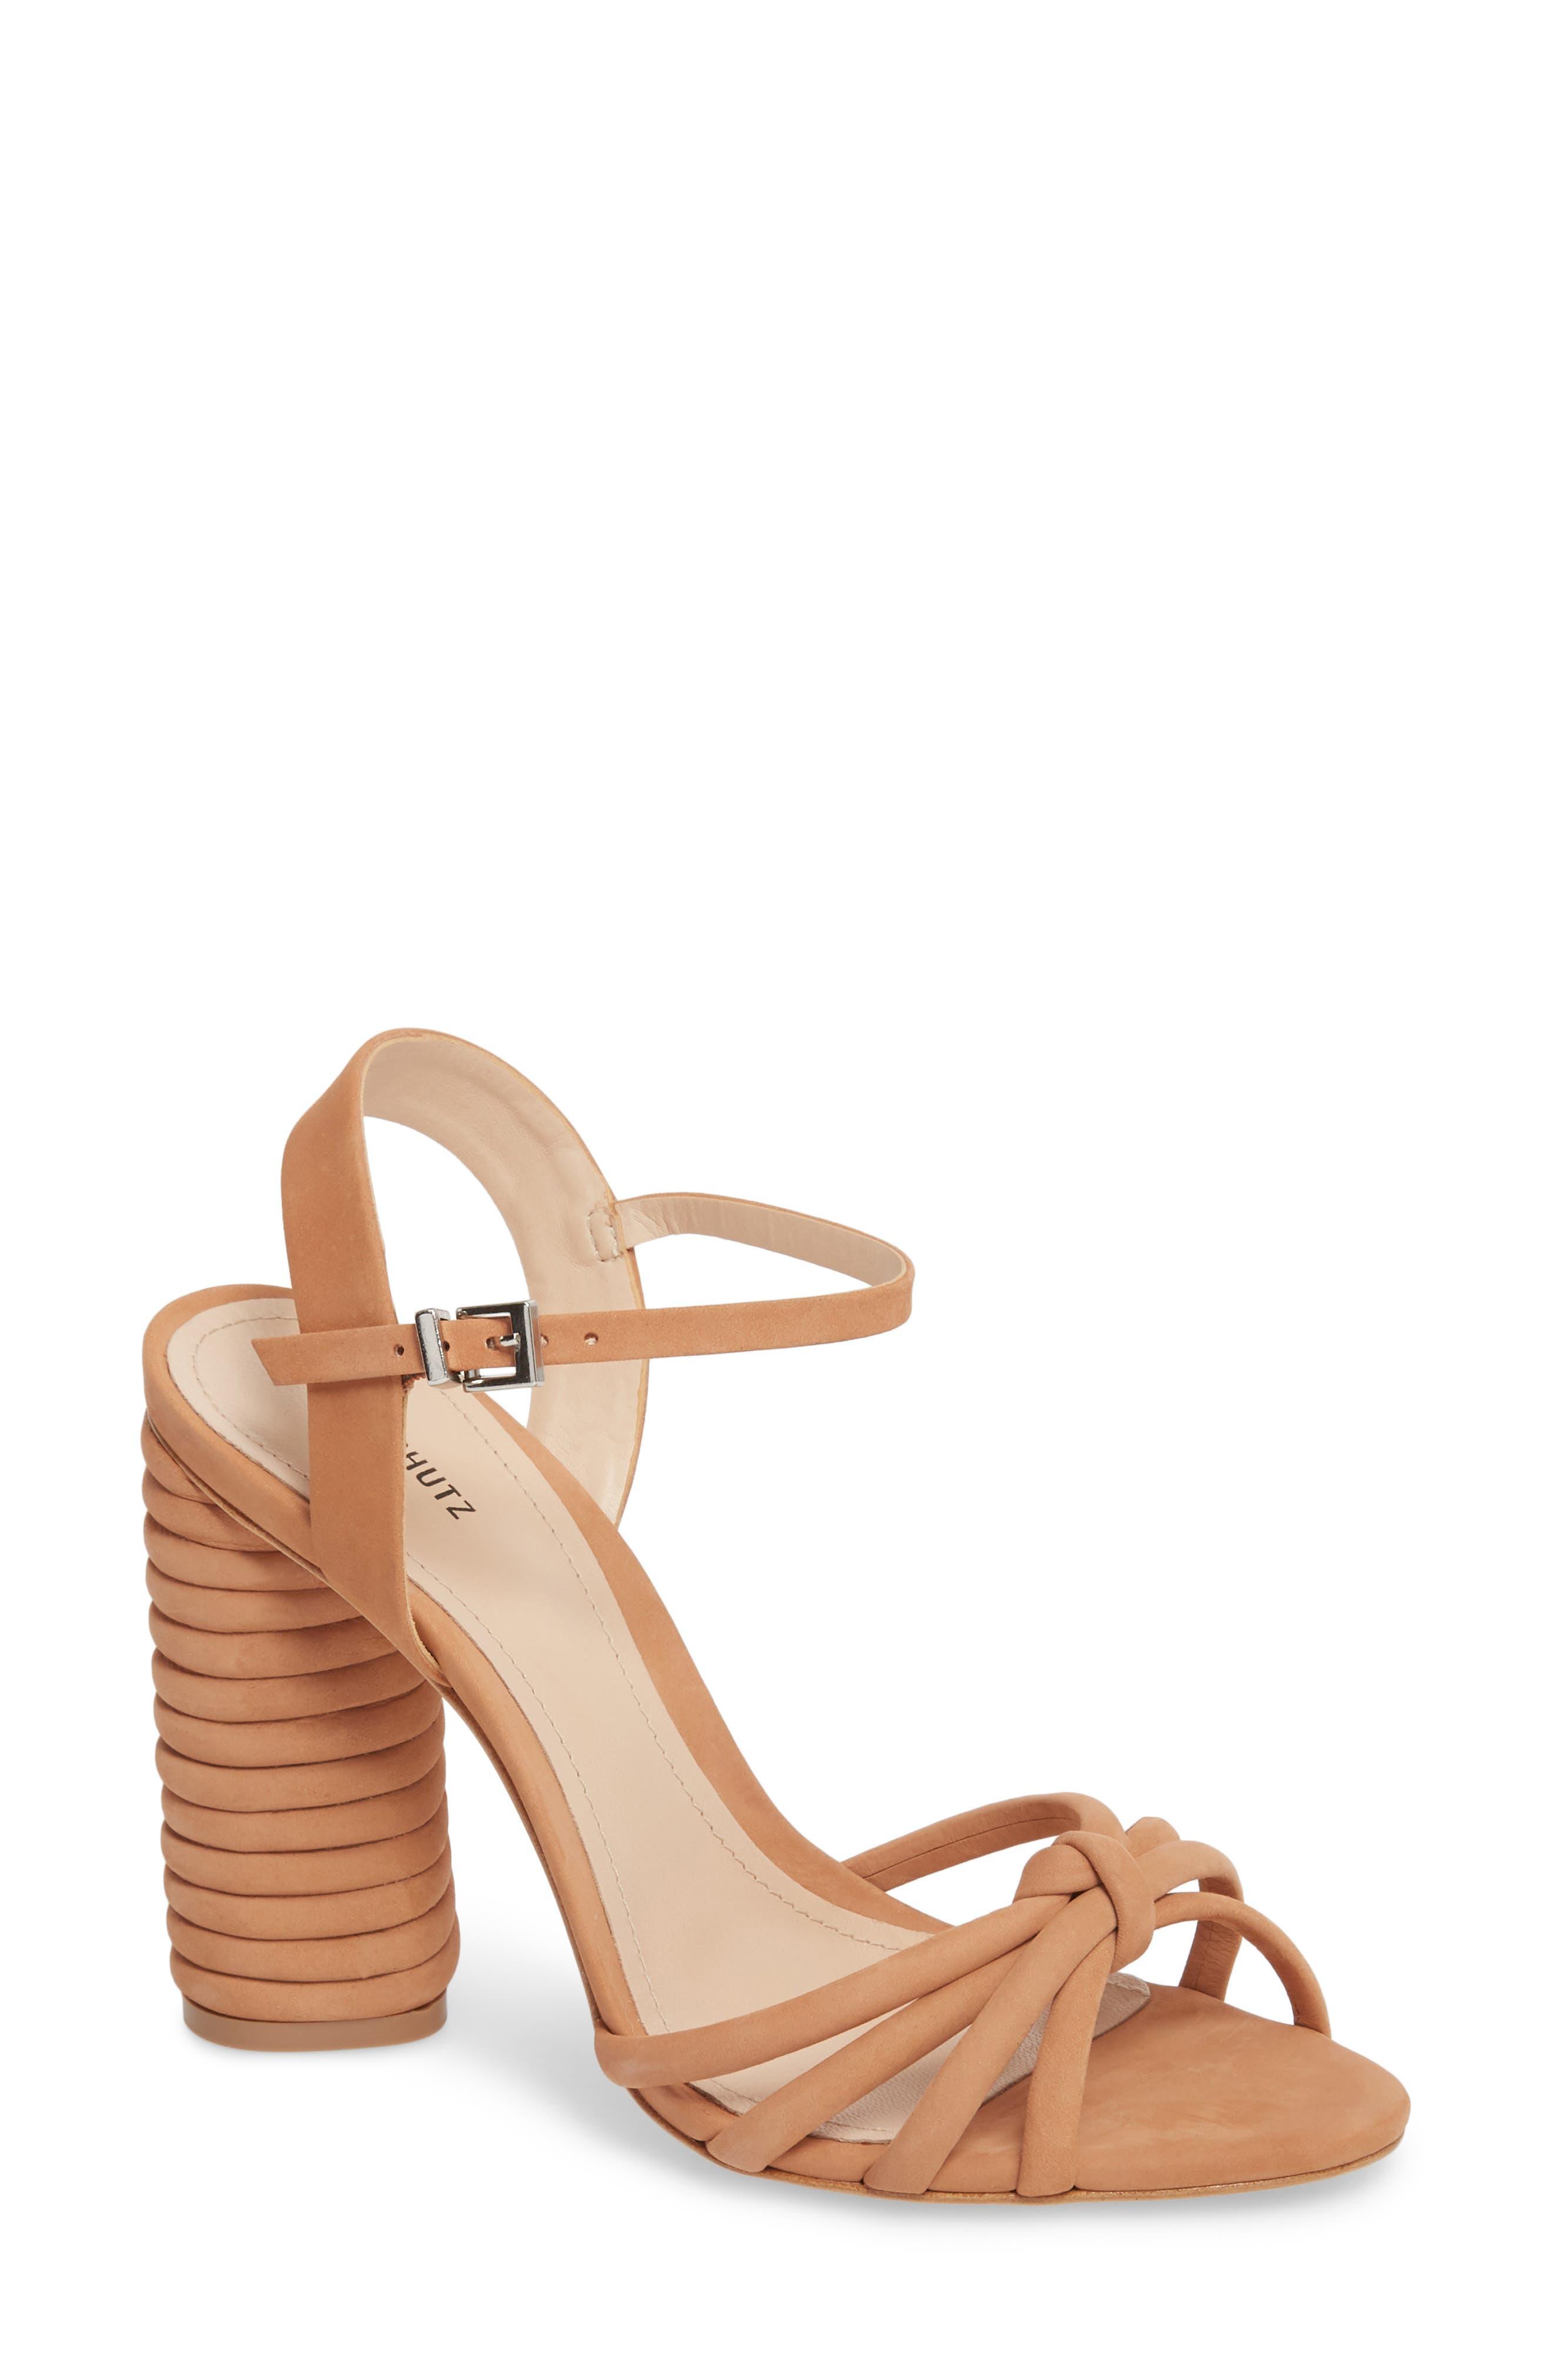 Paolla Column Heel Sandal,                         Main,                         color, TOASTED NUT